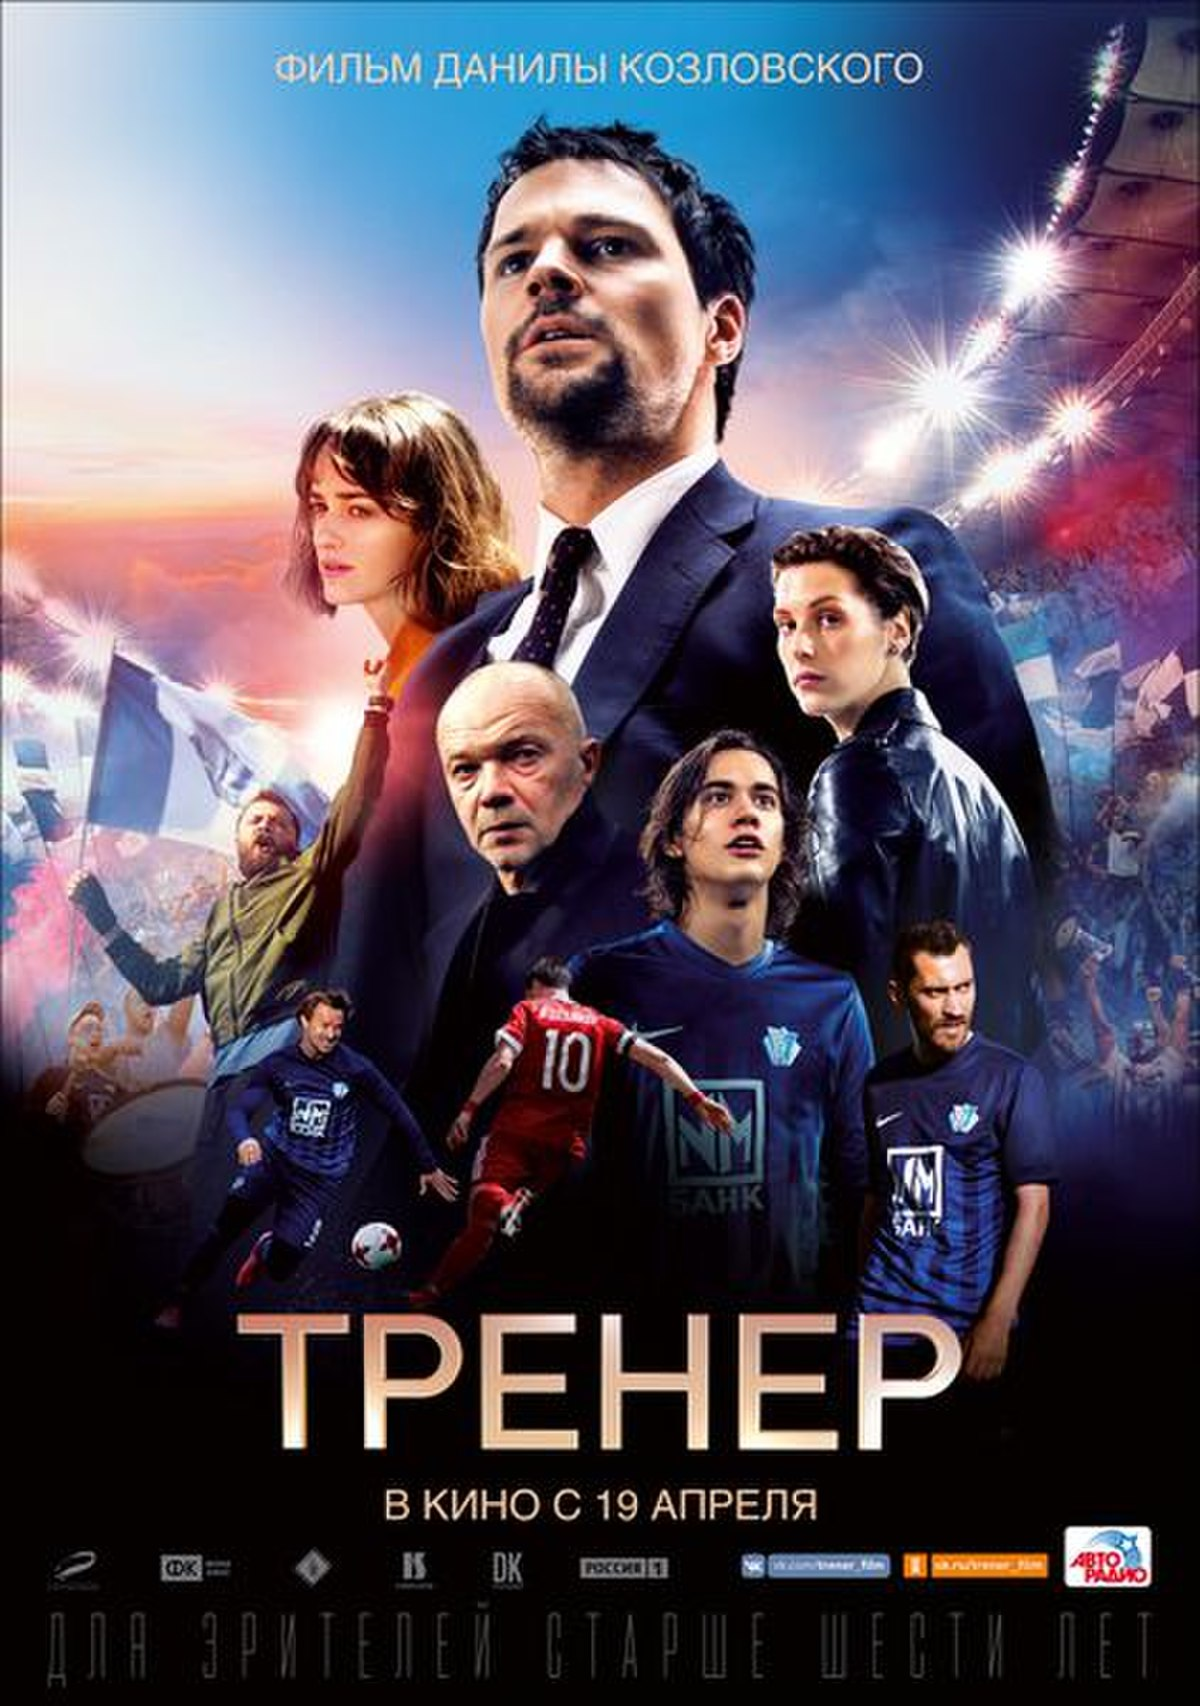 Тренер фильм